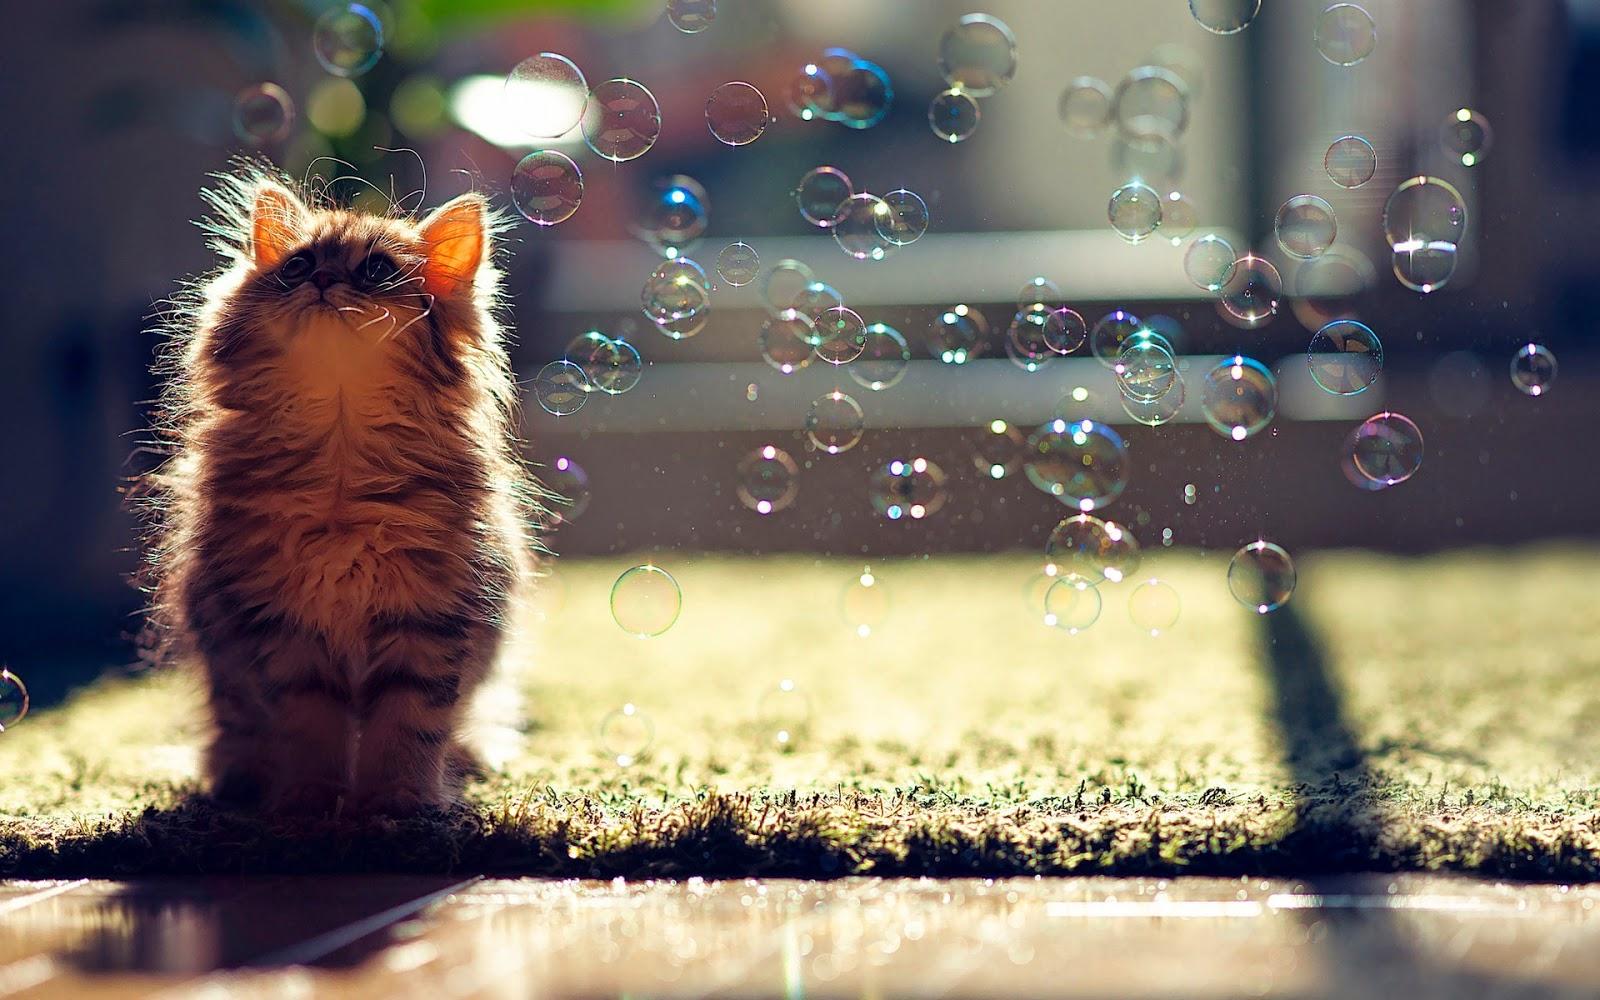 - Cute kittens hd wallpaper free download ...